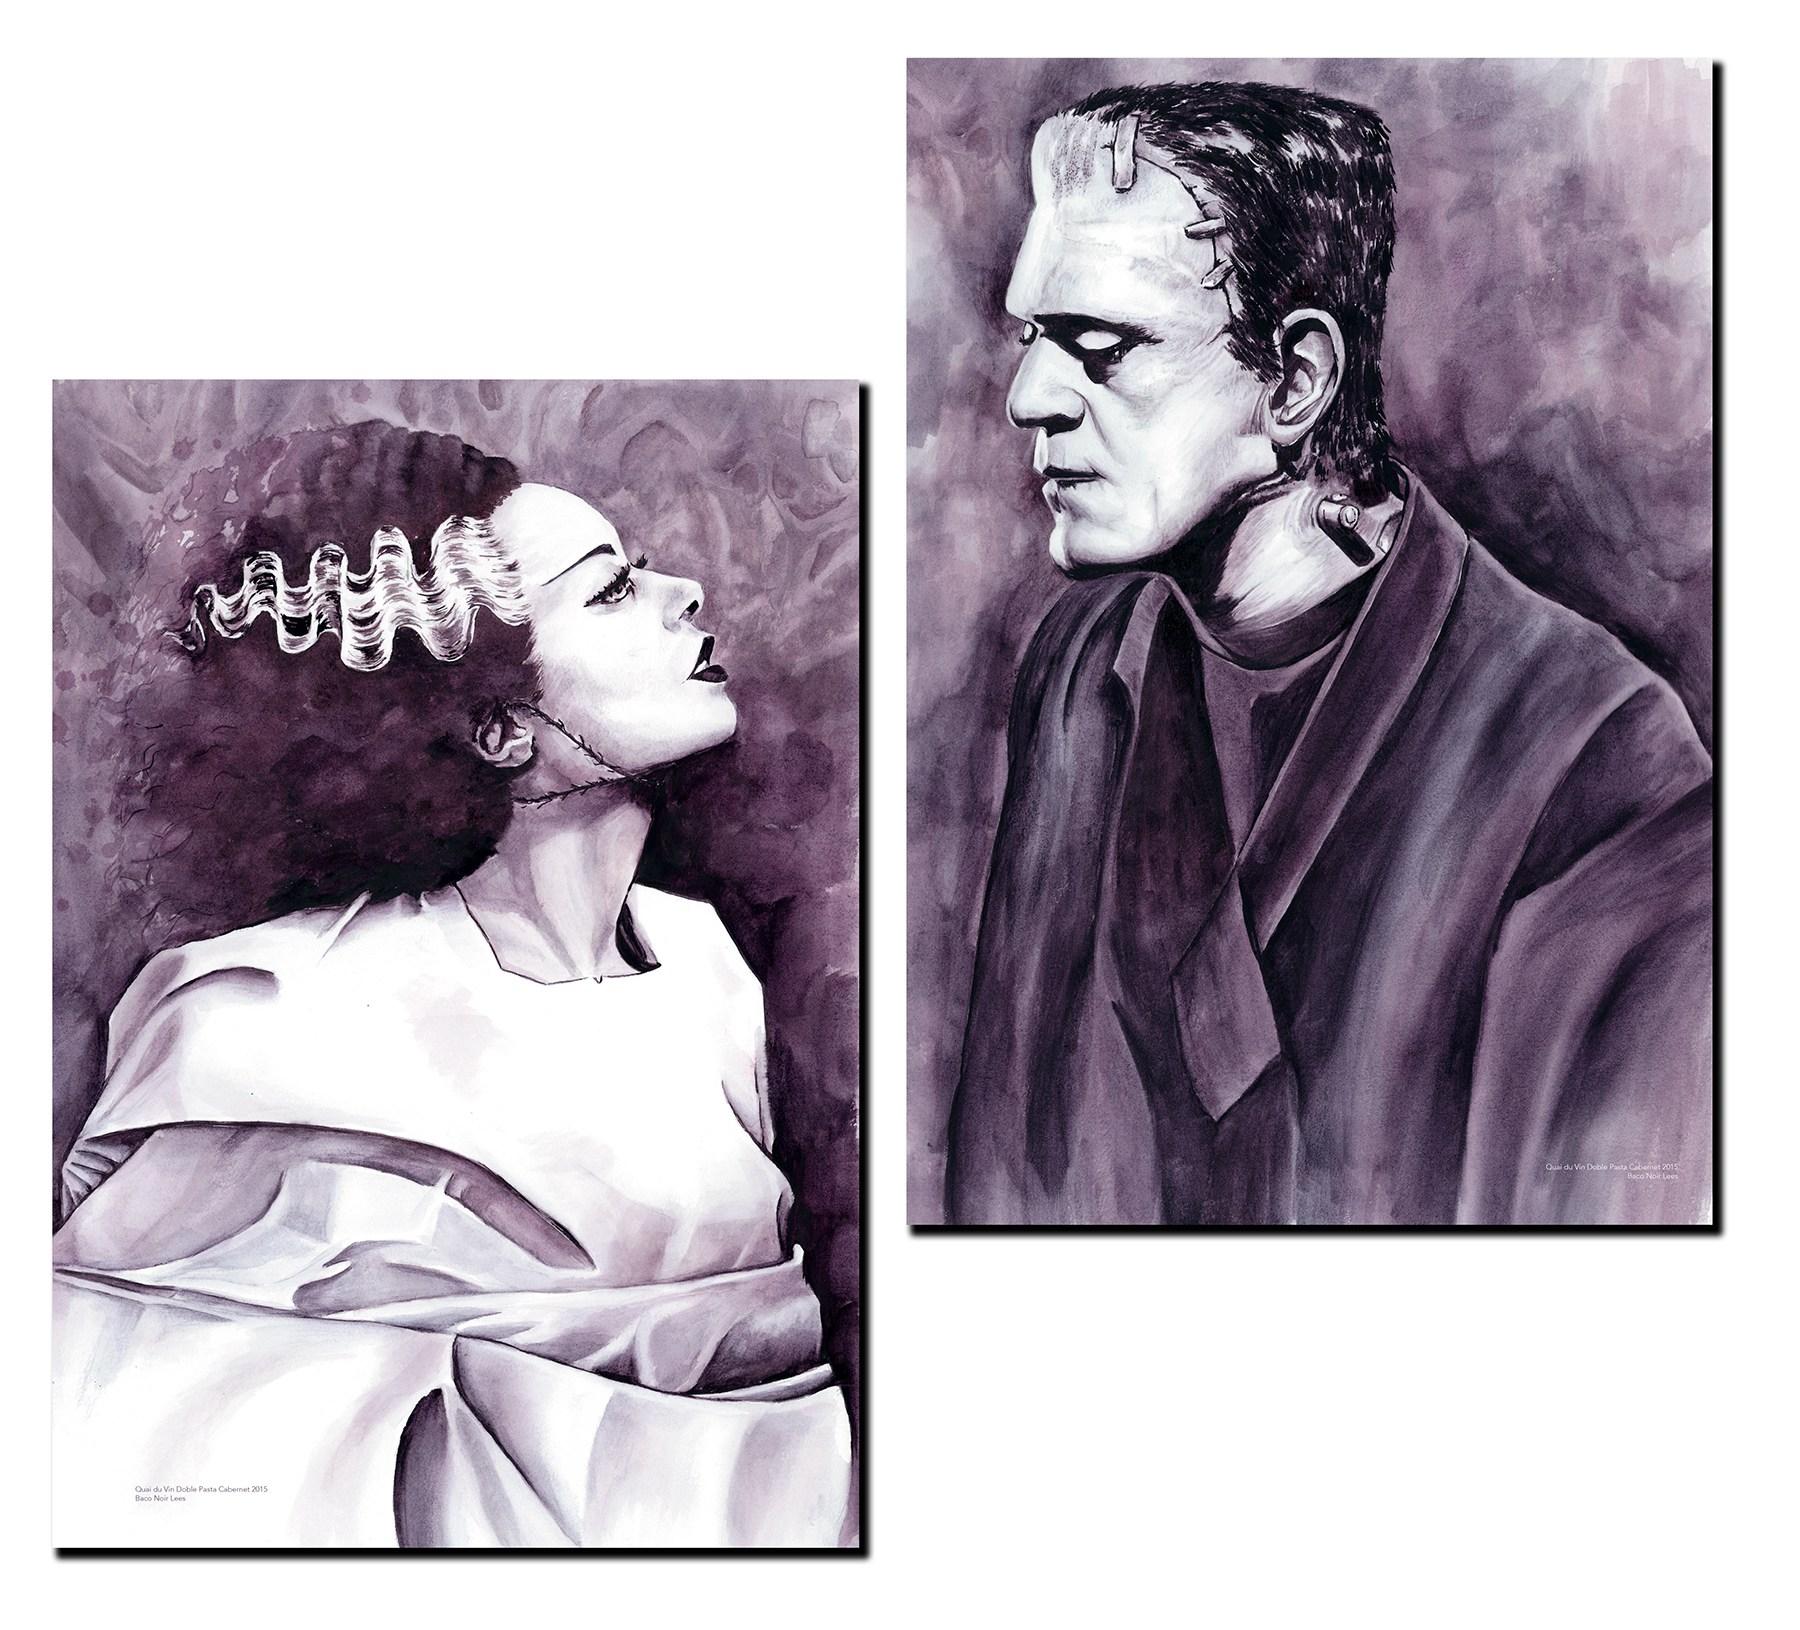 Bride of Frankenstein by Melissa Proudlock Painted with Wine wine painting.jpg